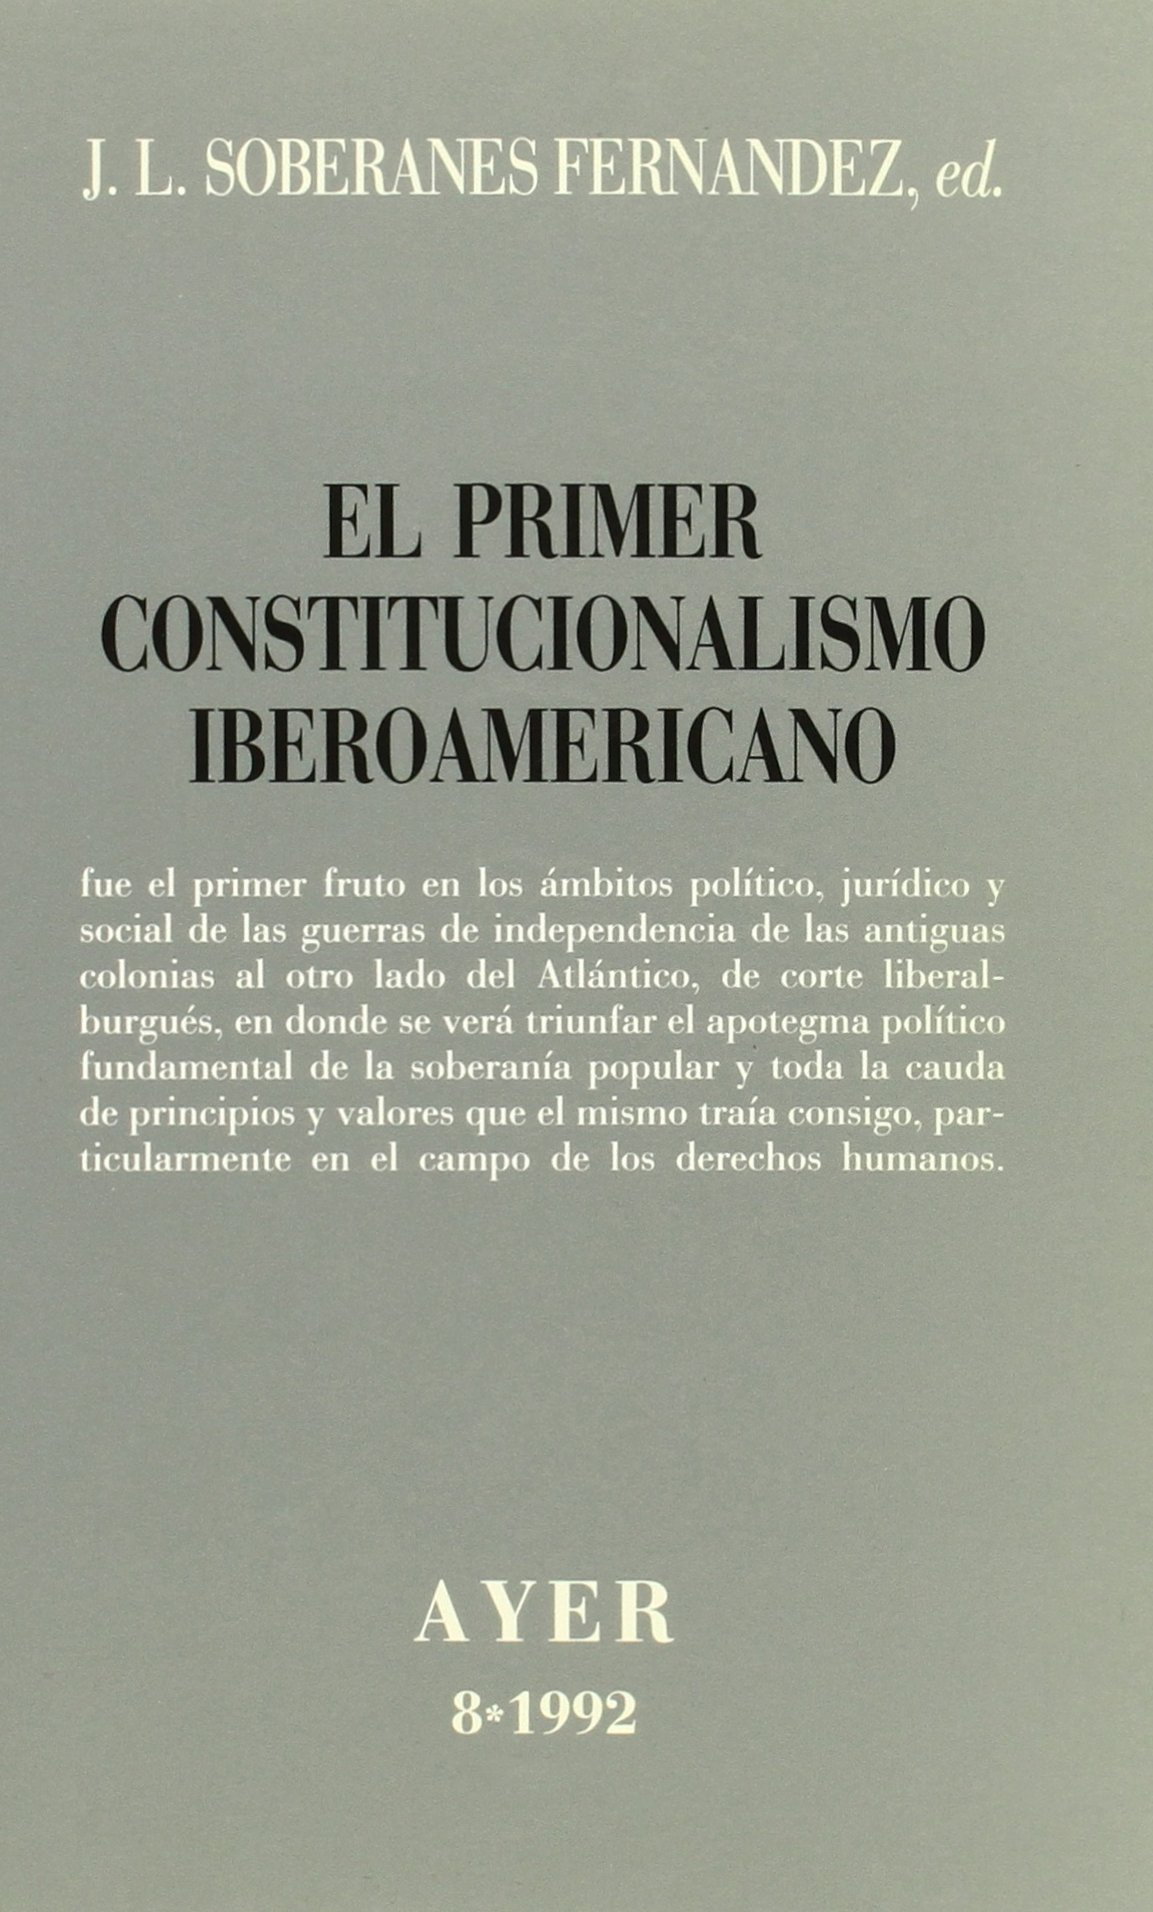 El primer constitucionalismo iberoamericano (Ayer) (Spanish Edition): José Luis Soberanes Fernández: 9788487827082: Amazon.com: Books